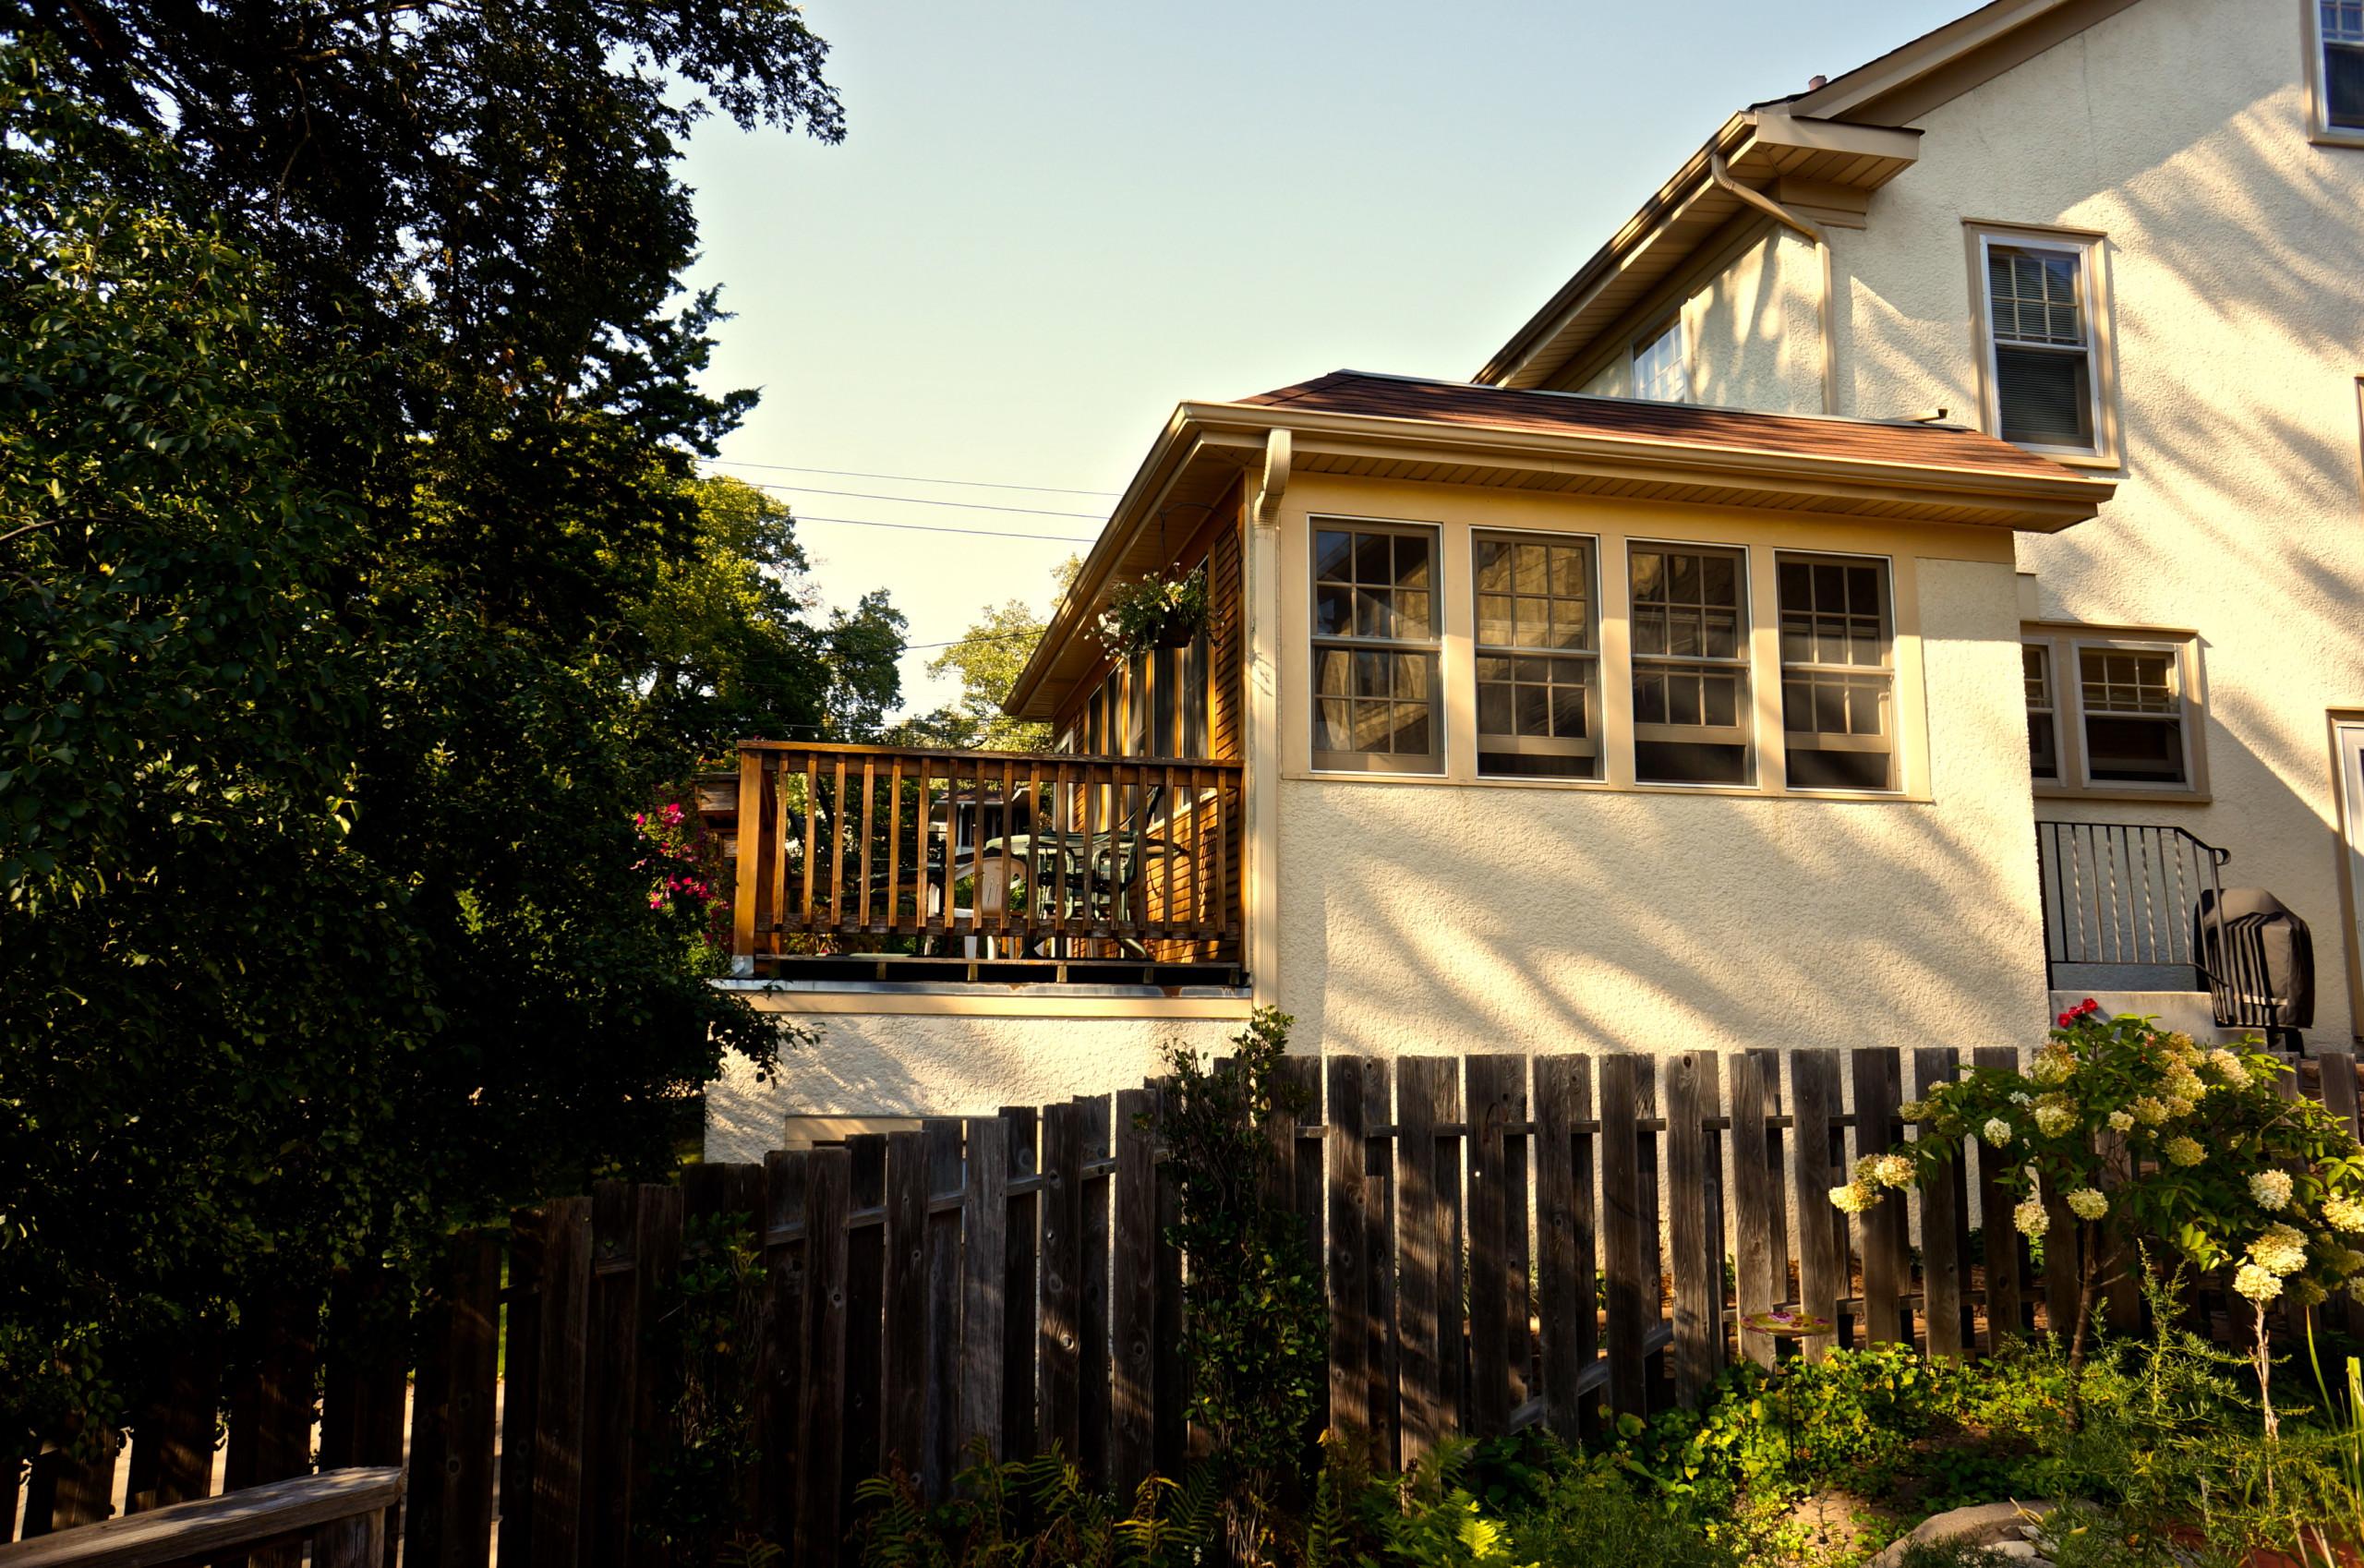 Garage Addition with 3 Season Porch